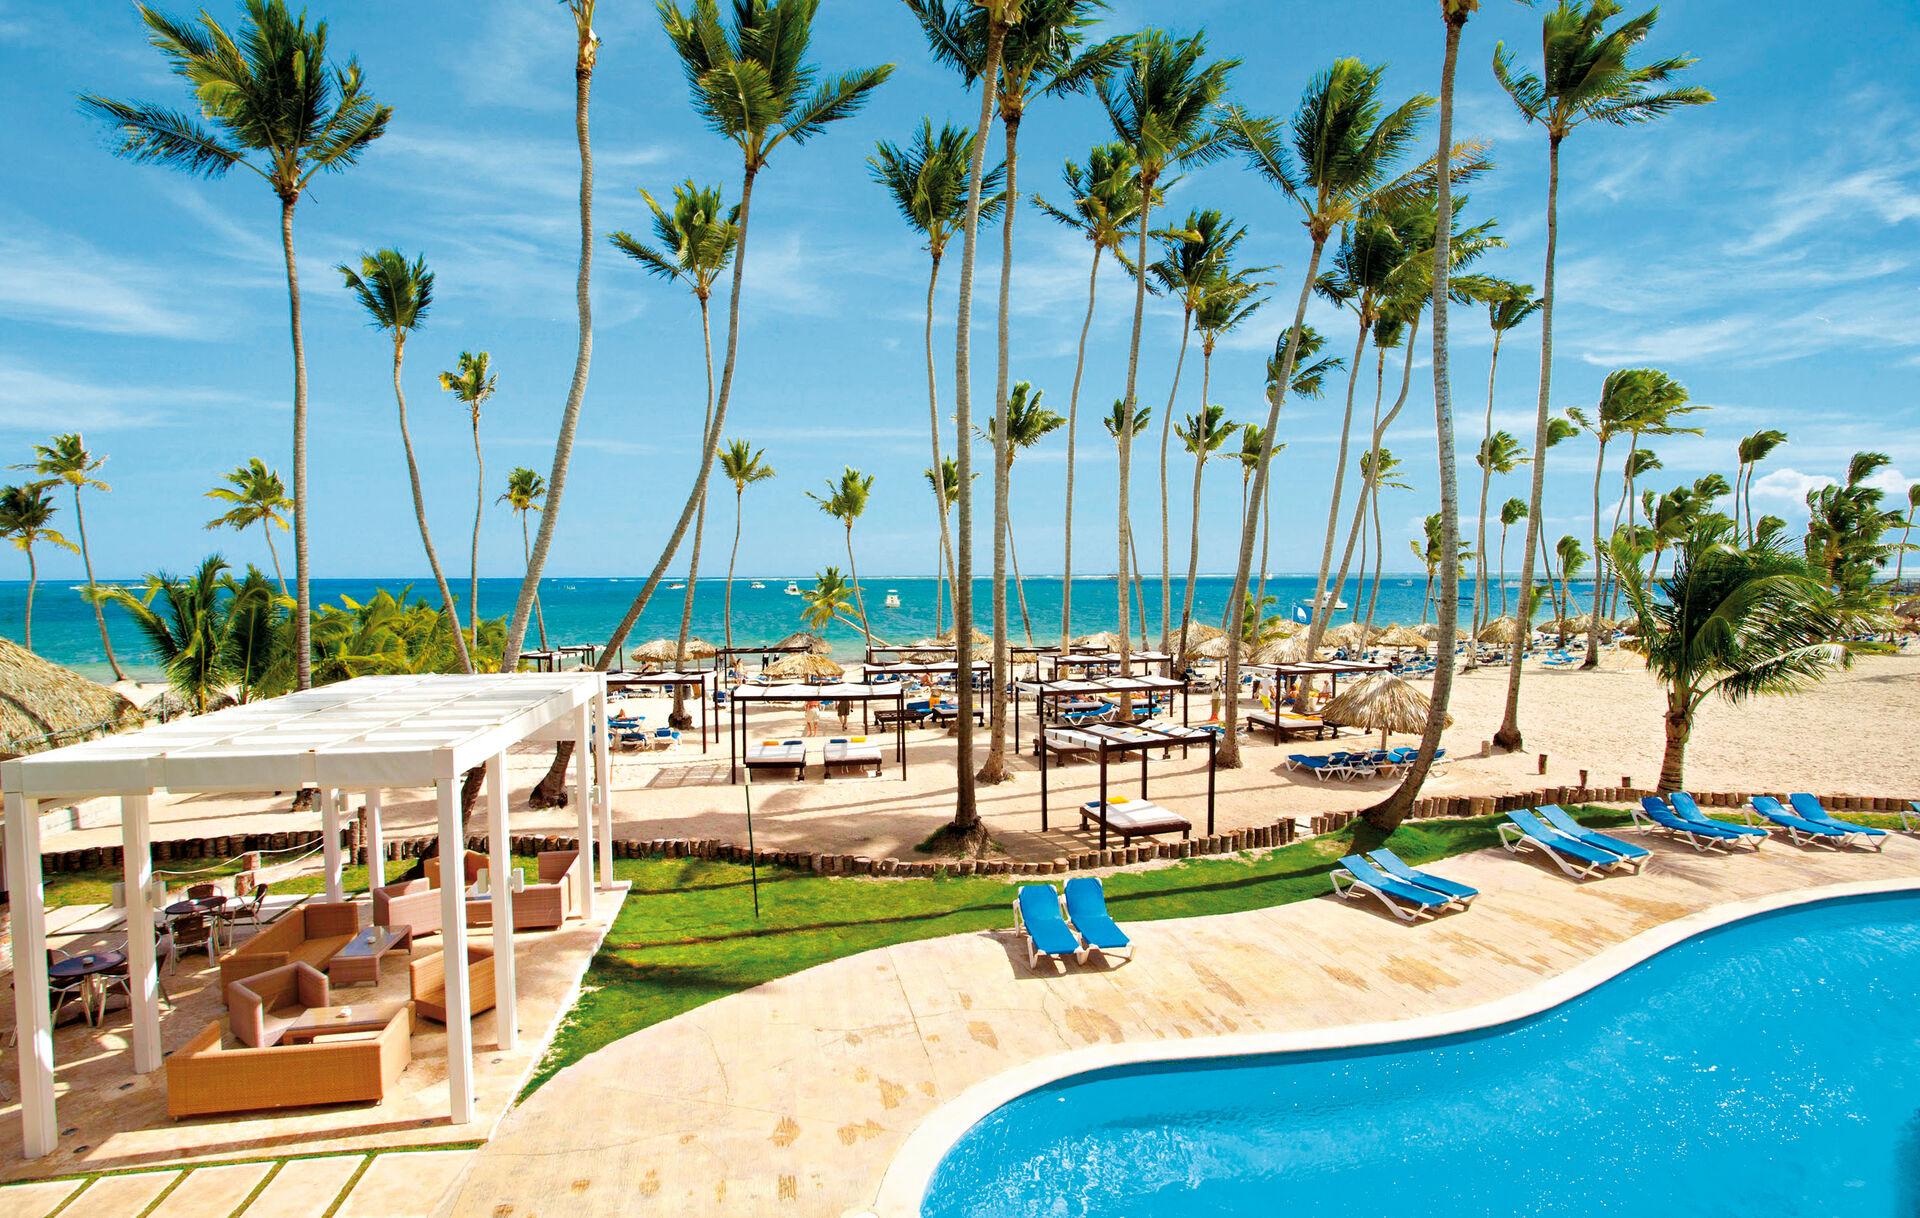 Le Club FTI Privilège Be Live Collection Punta Cana (avec chauffeur privé-Adult Only) - 5*